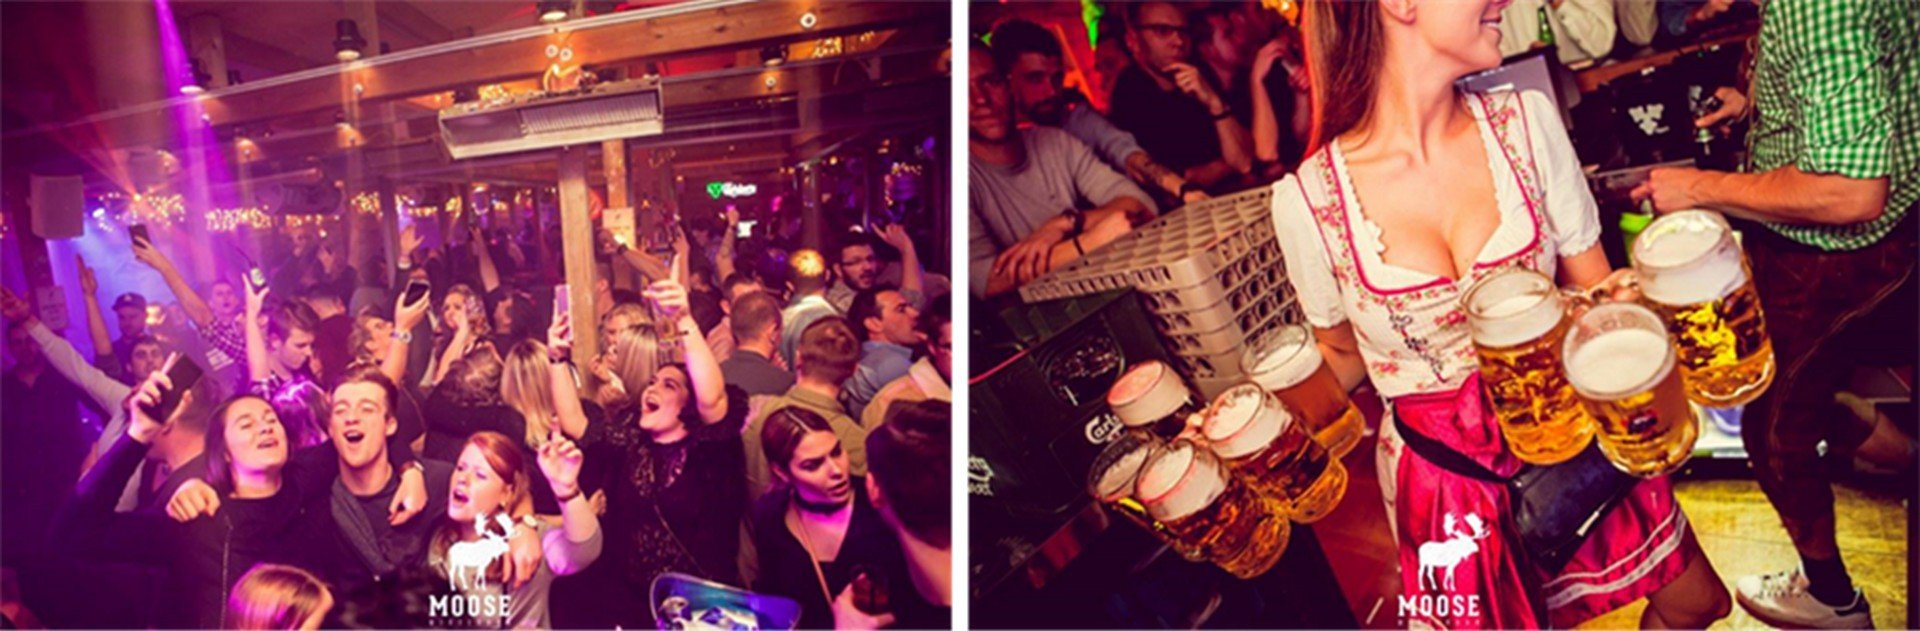 MOOSE Bar brengt Anton aus Tirol naar het Sportpaleis! - Moose Bar XXL 2